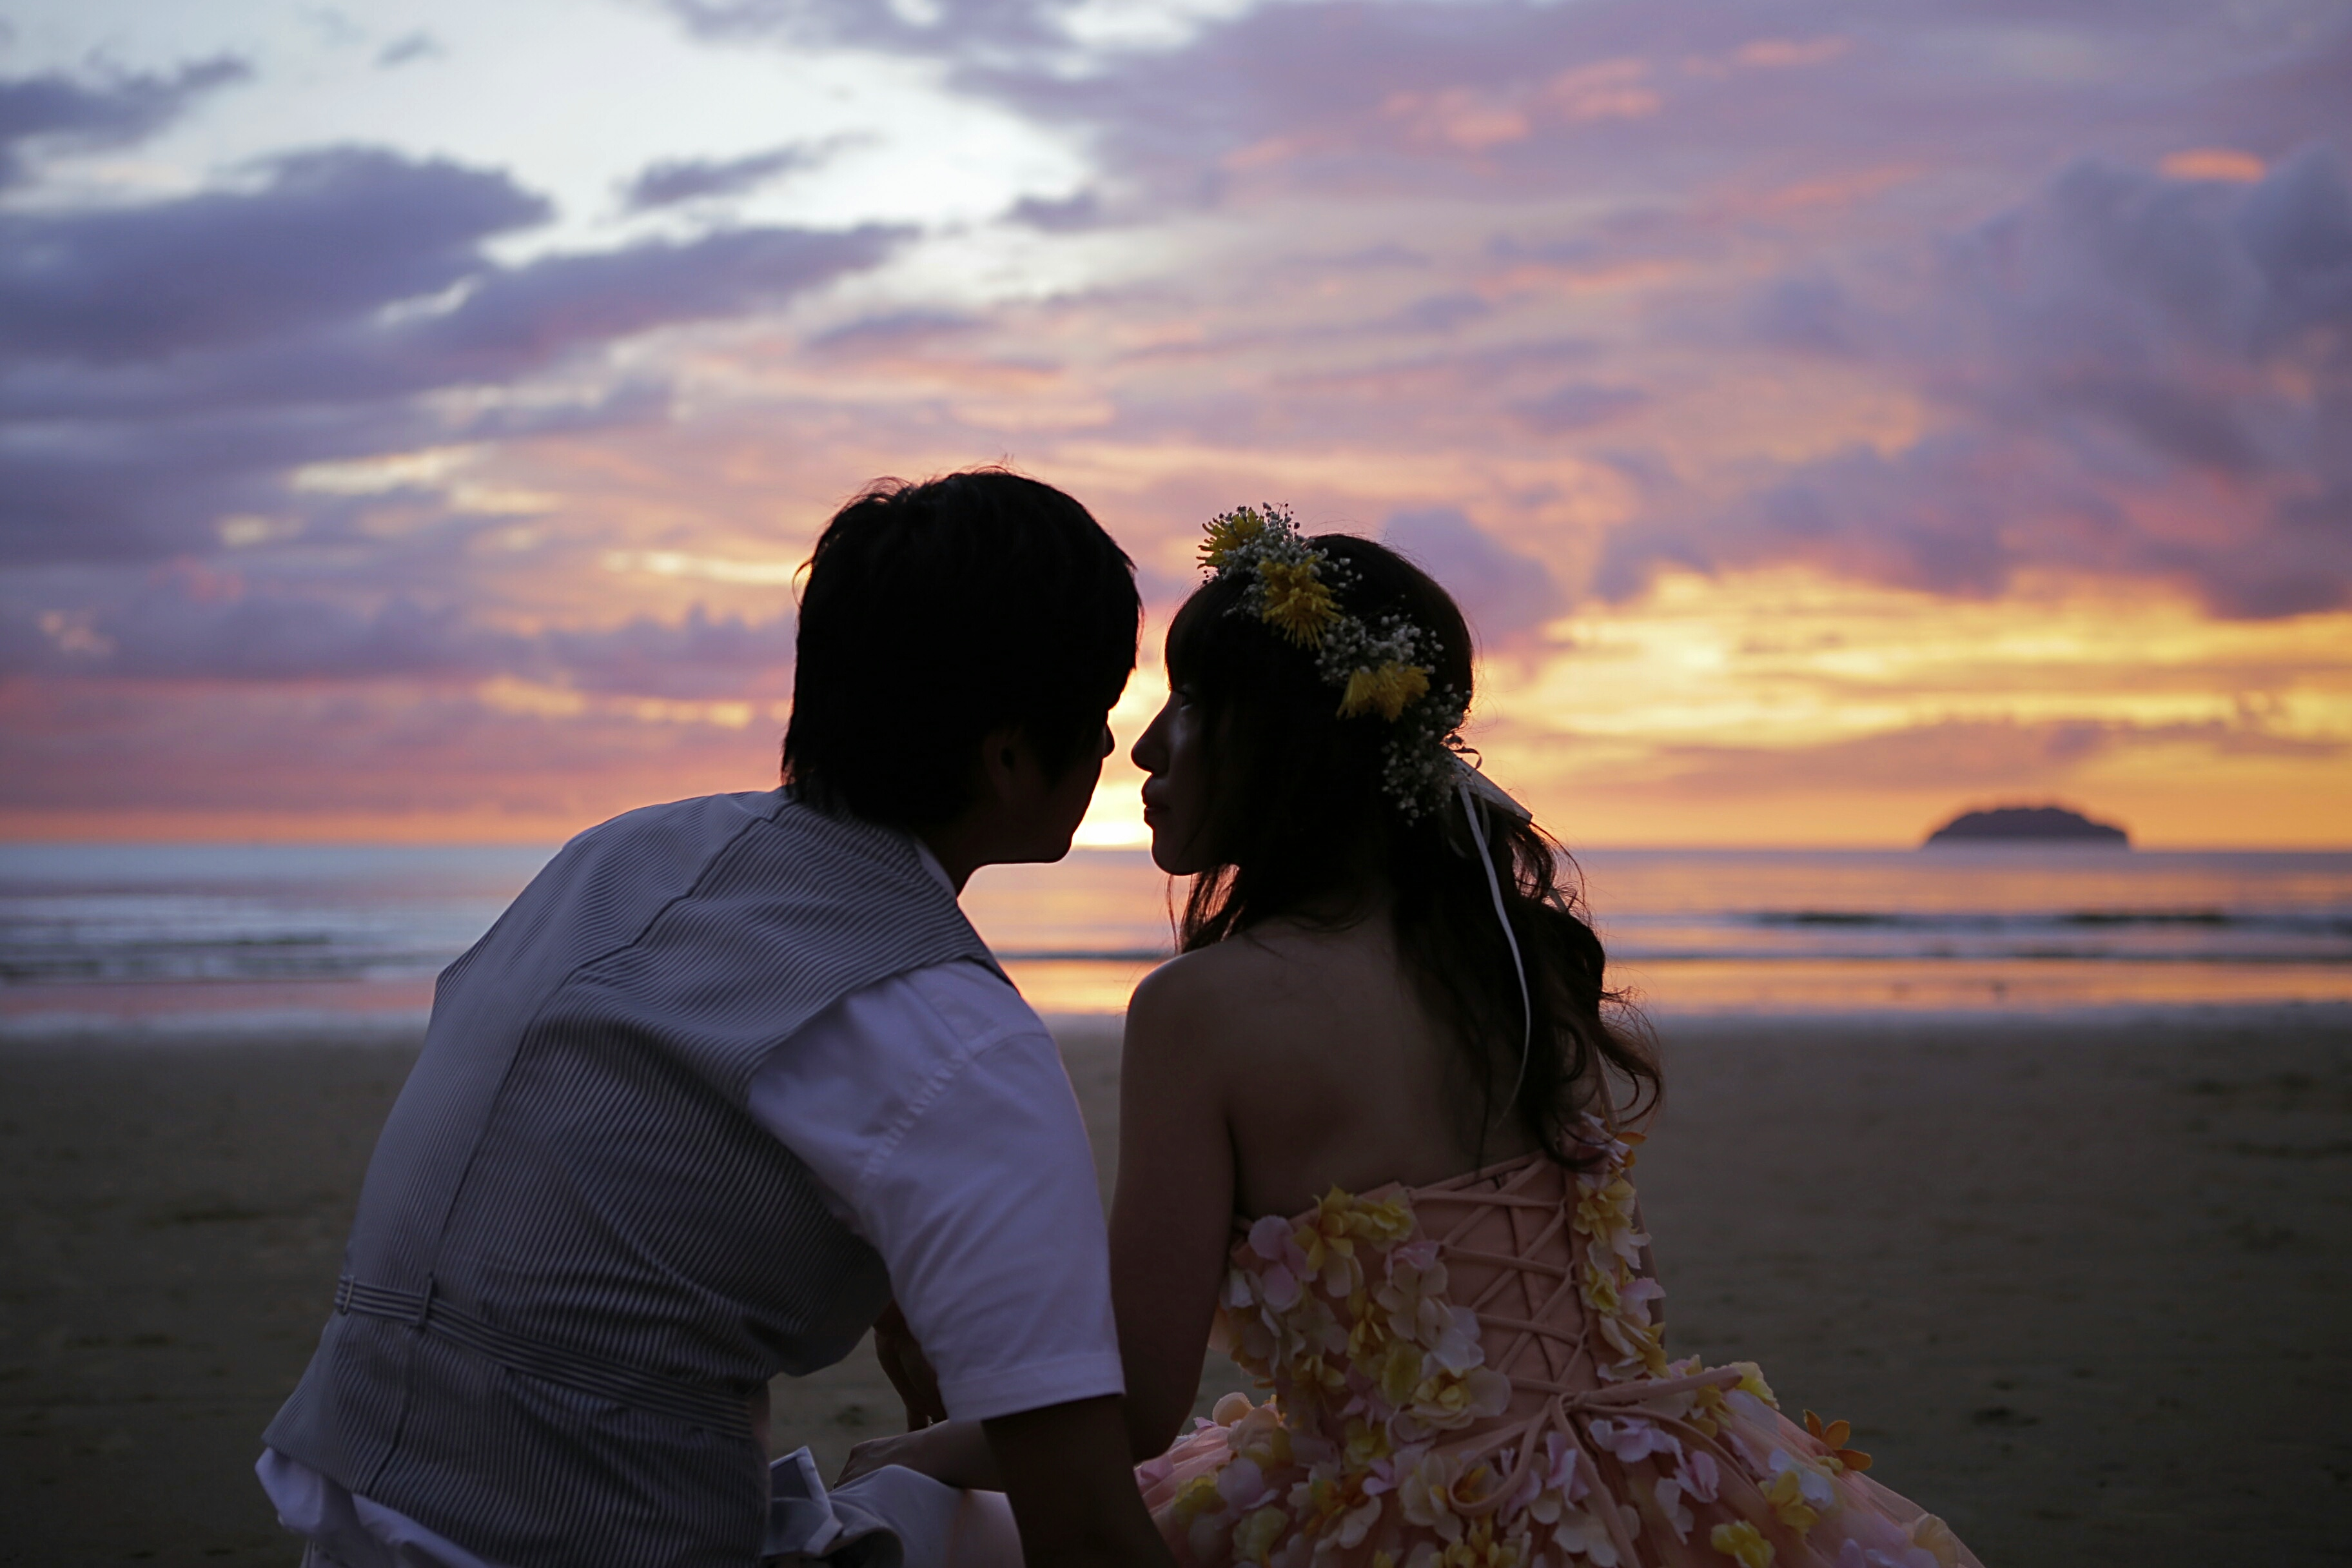 malaysia prewedding photoshooting photoweding kotakinabalu sunset